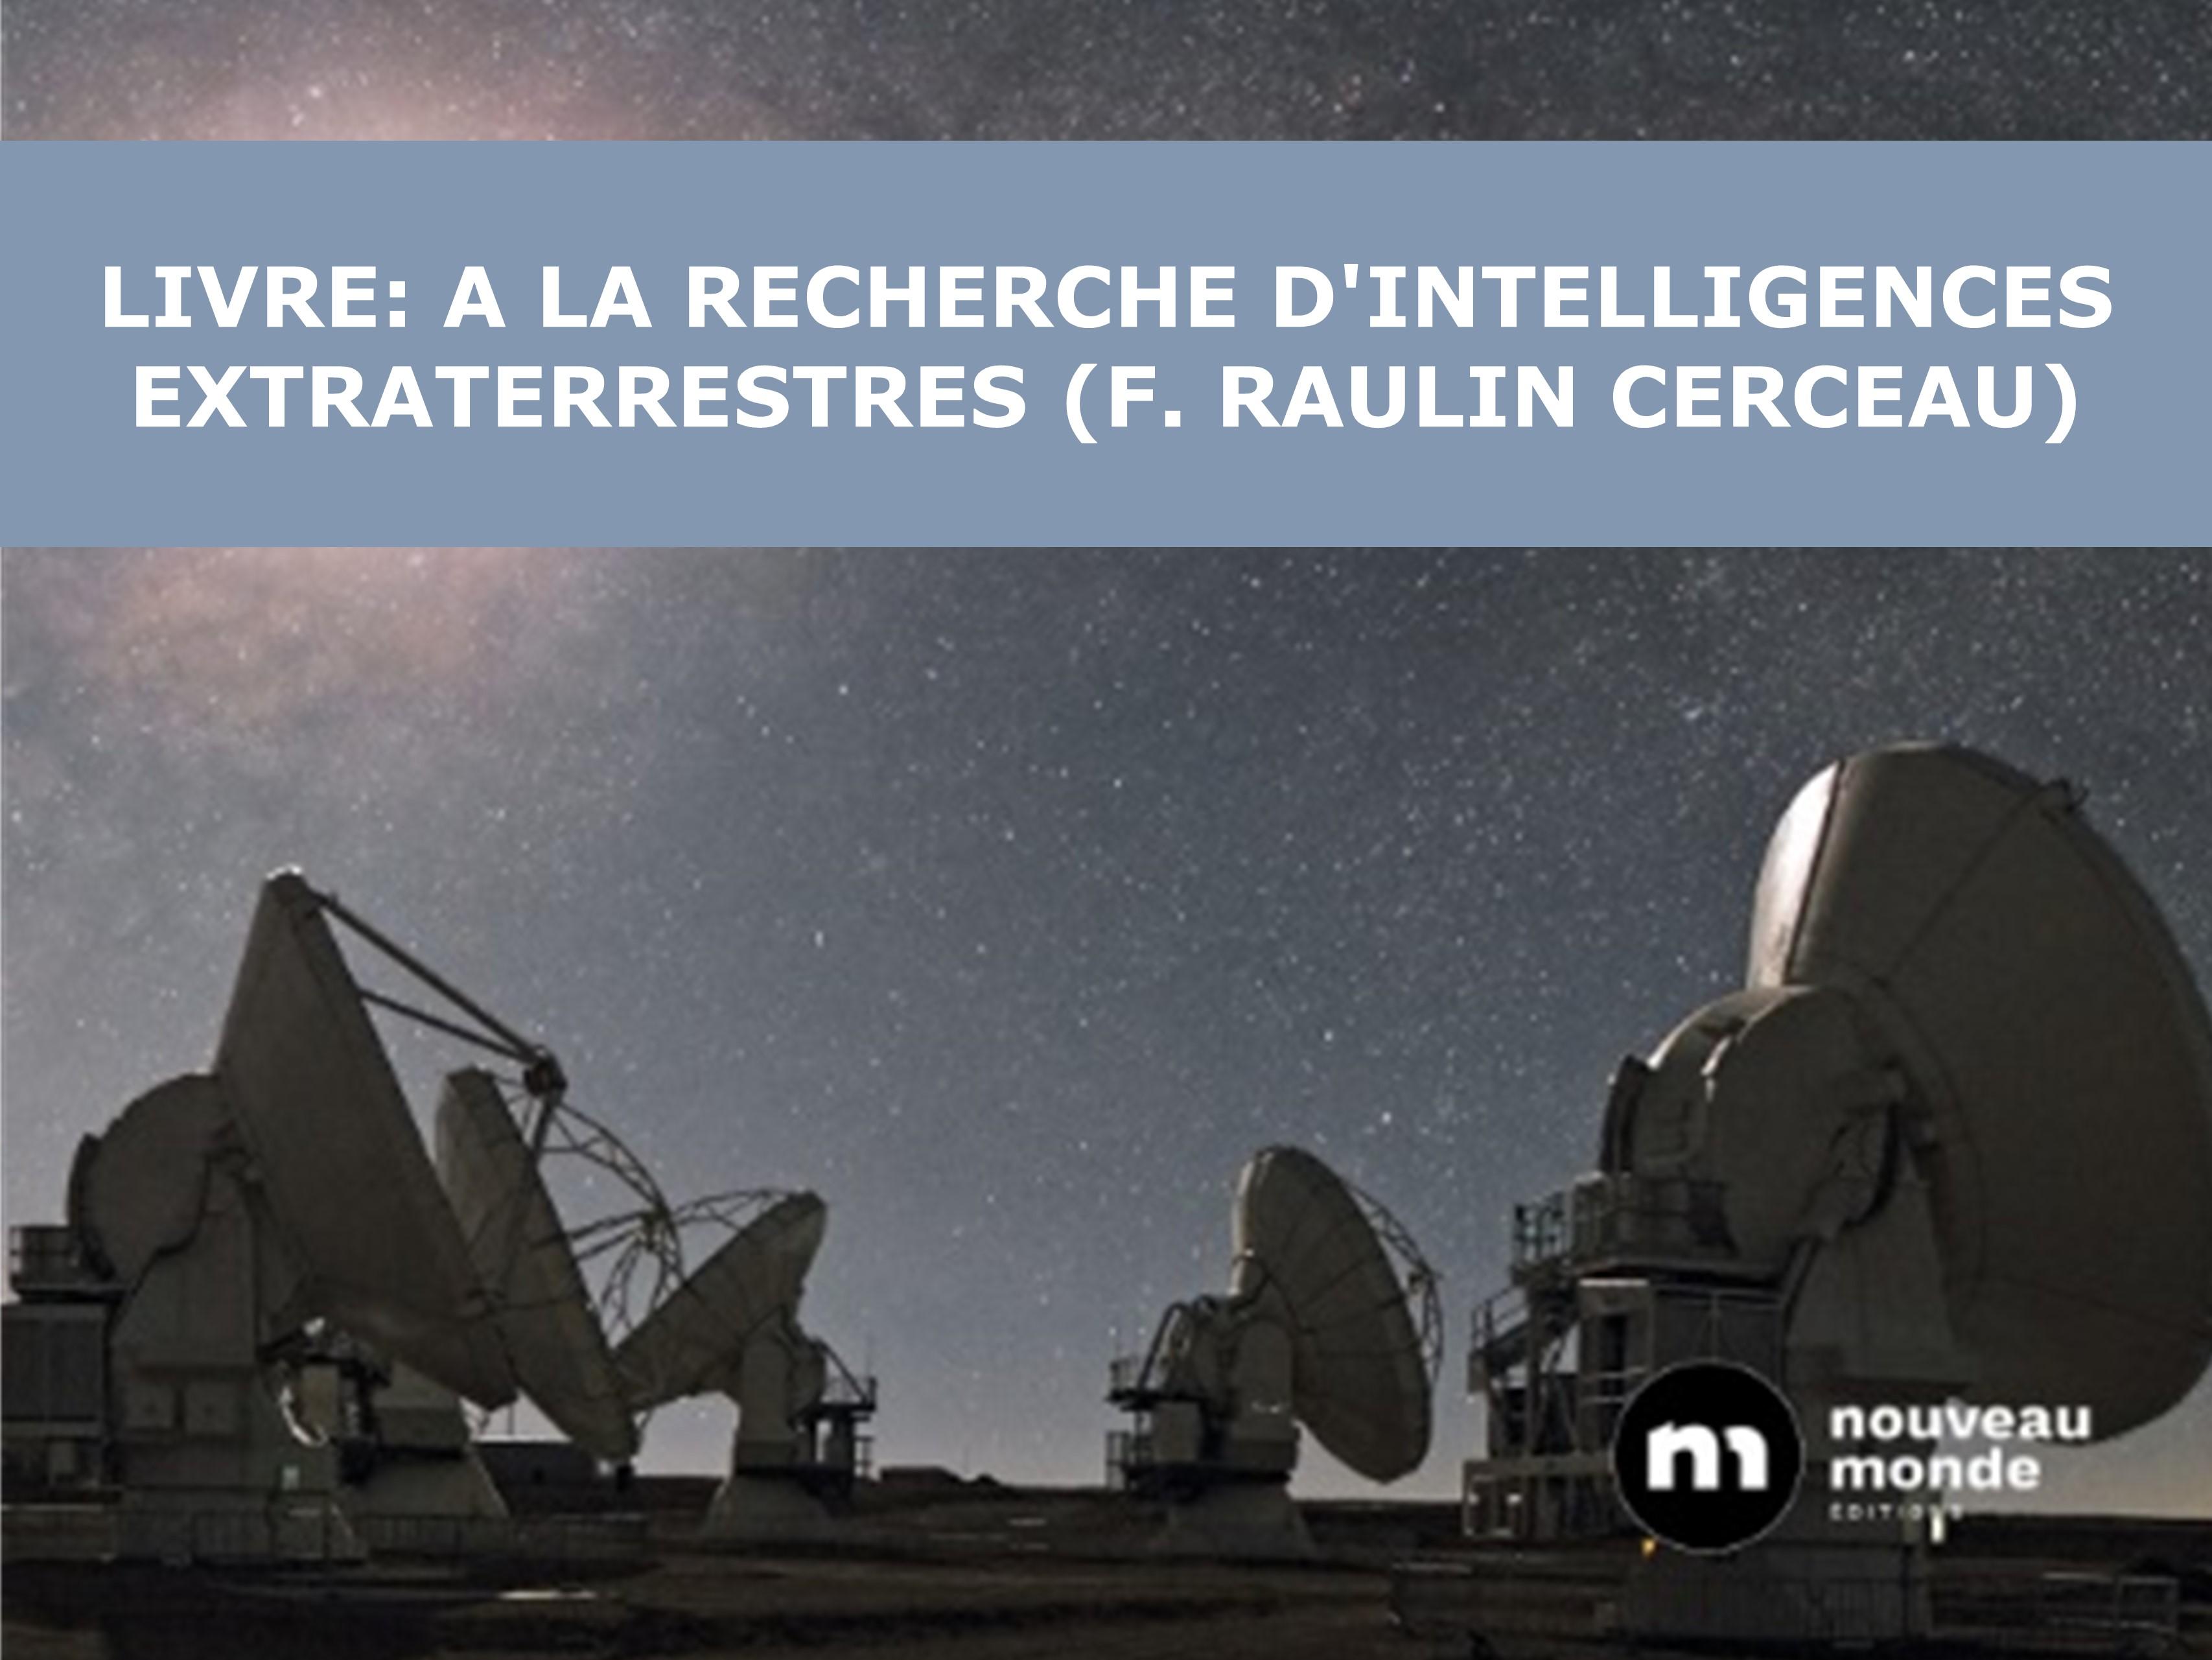 Livre: A la recherche d'intelligences extraterrestres (F. Raulin Cerceau)